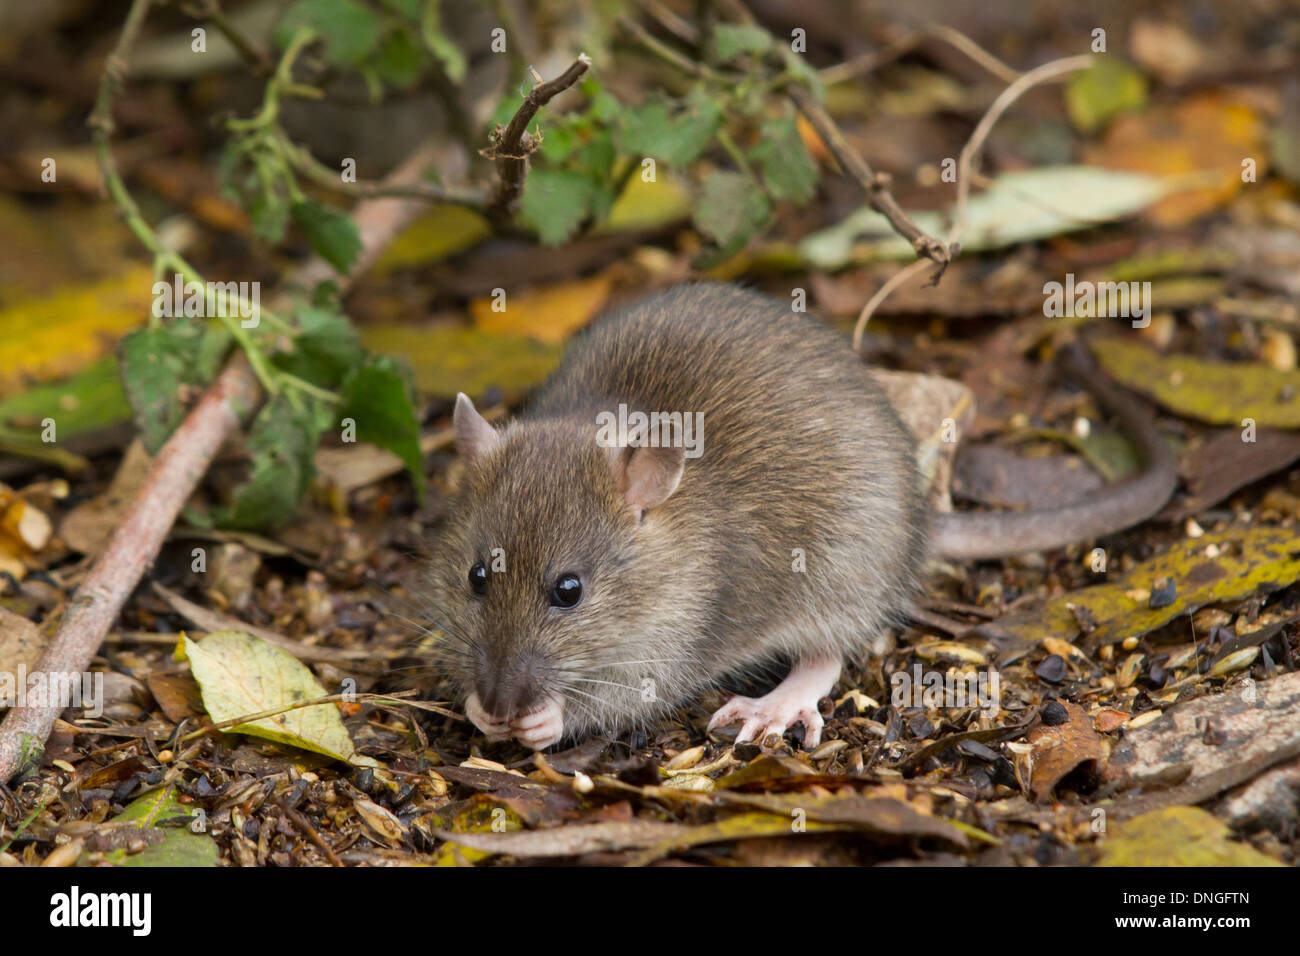 Brown Rat (Rattus norvegicus) feeding on spilt grain - Stock Image